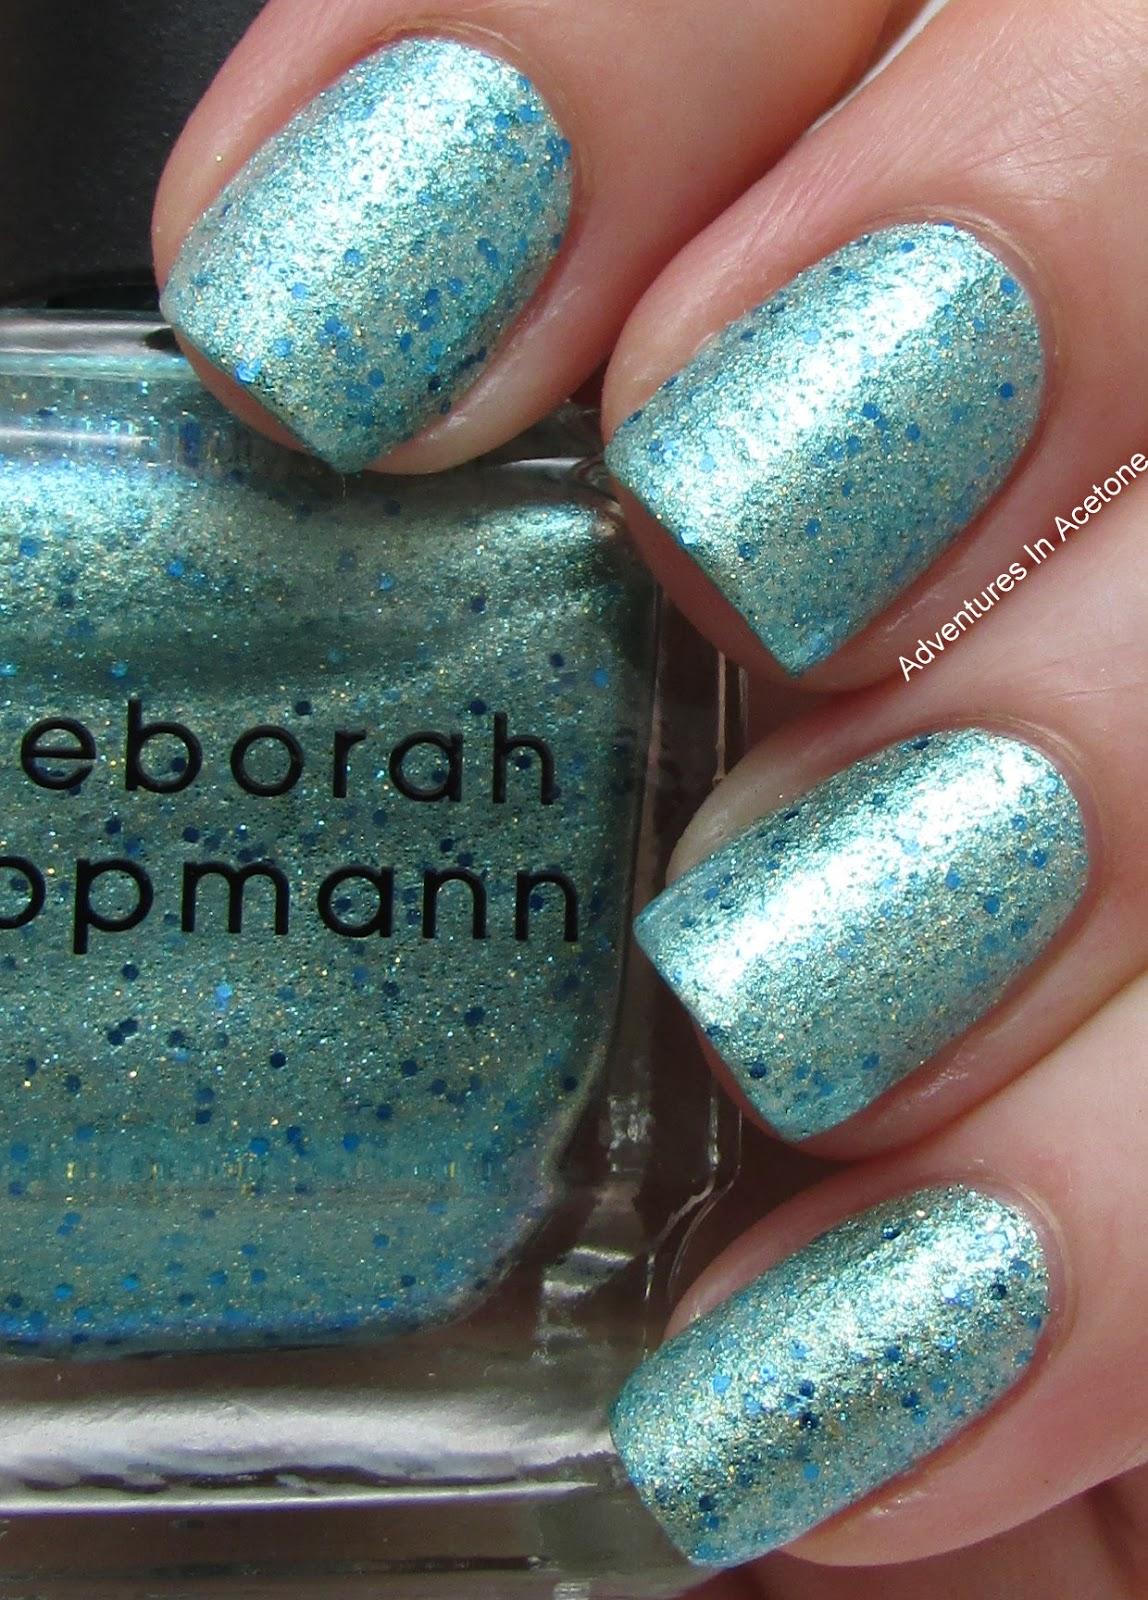 Deborah Lippmann in Mermaid's Dream